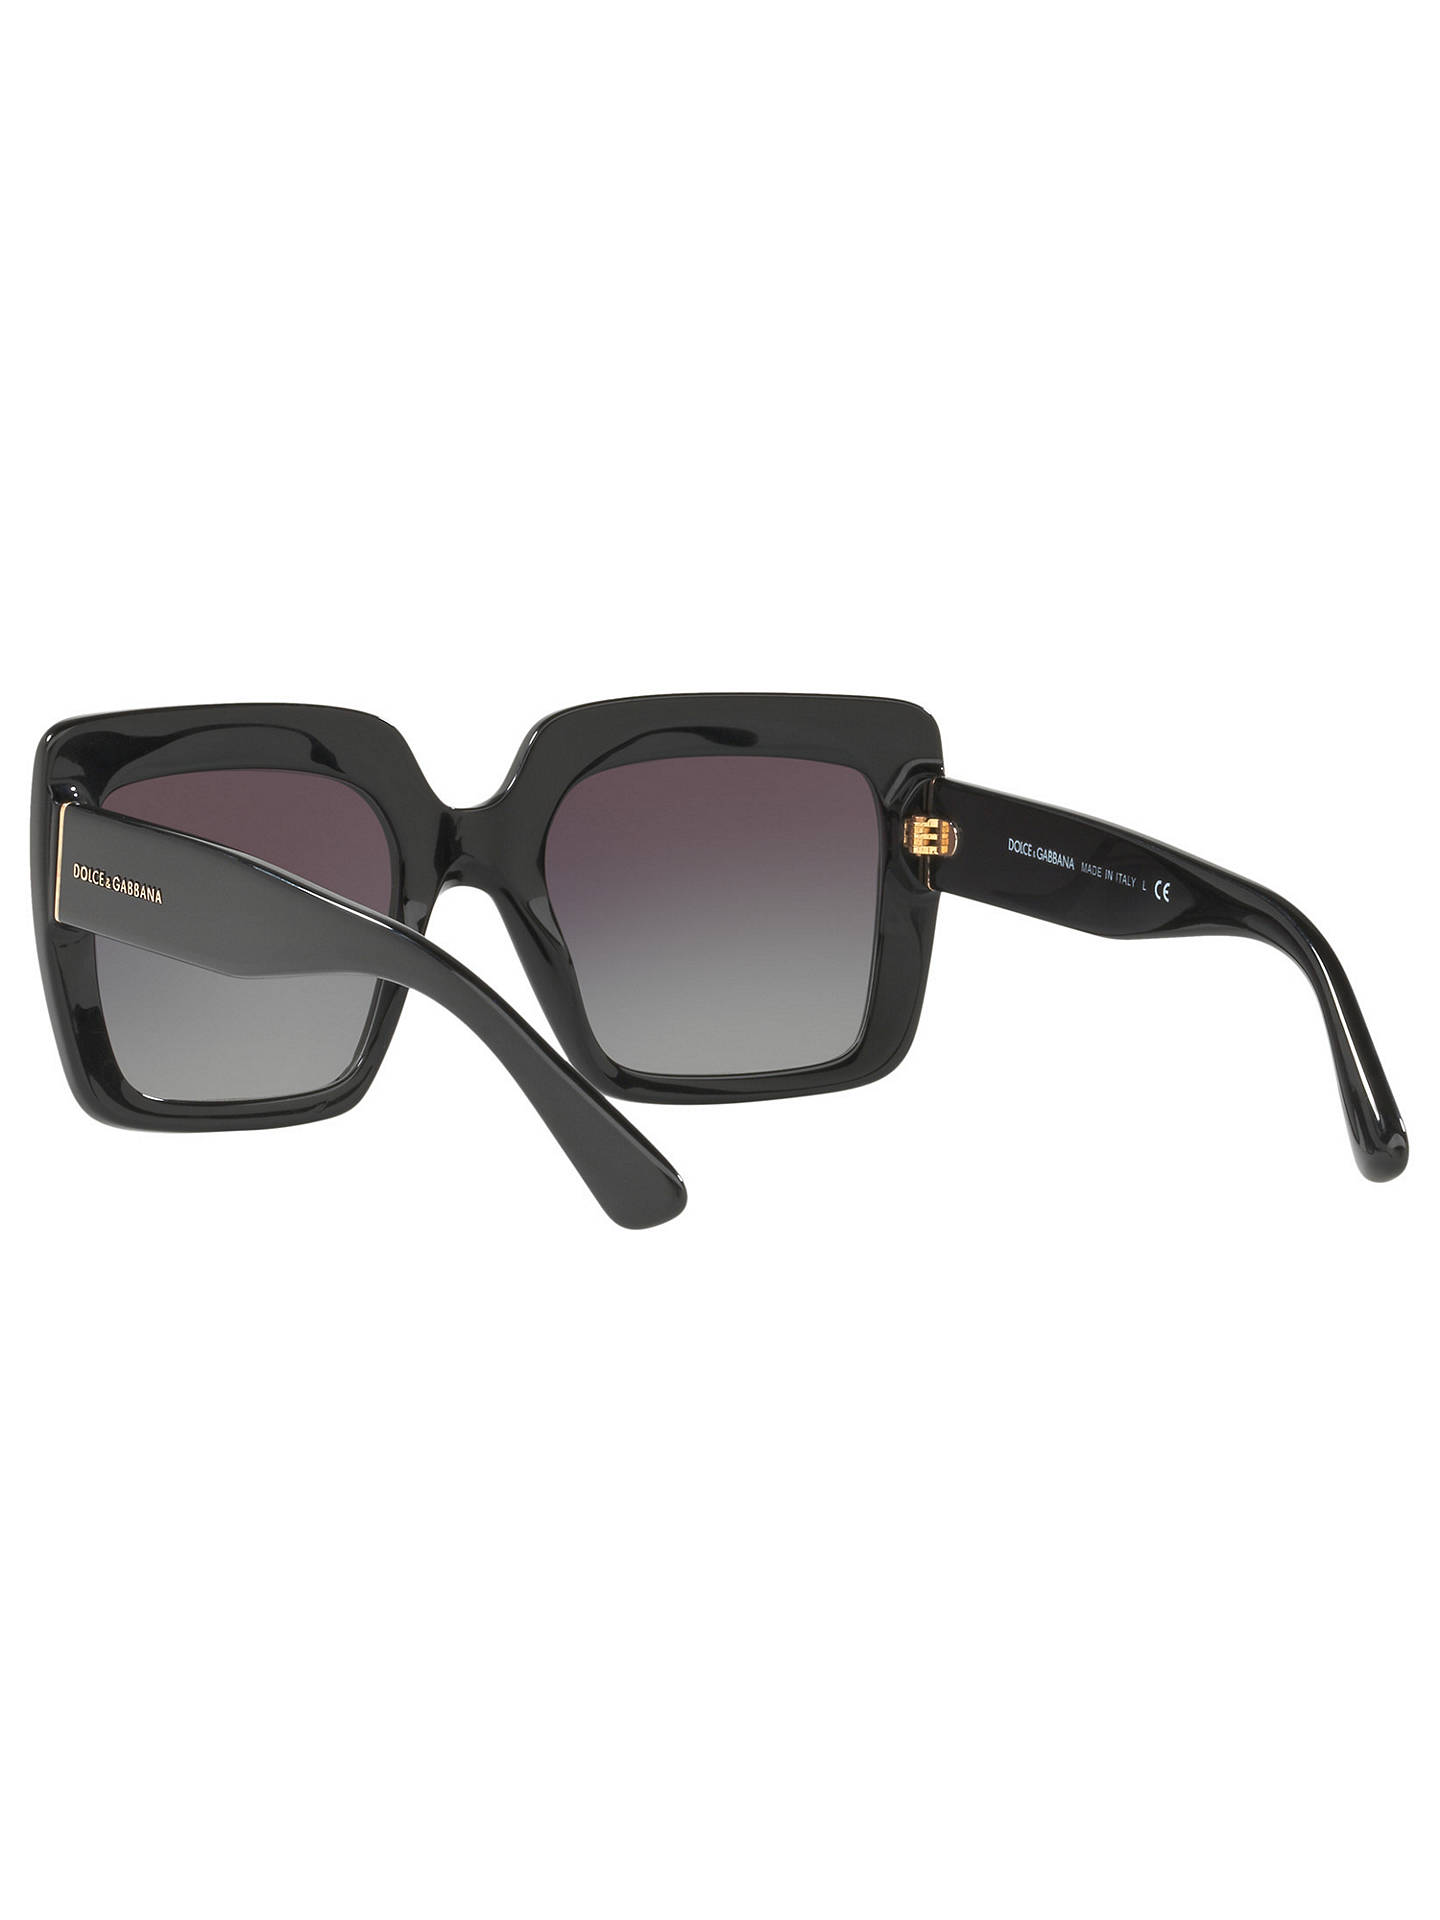 e7a24e1d099 ... Buy Dolce   Gabbana DG4310 Oversize Square Sunglasses